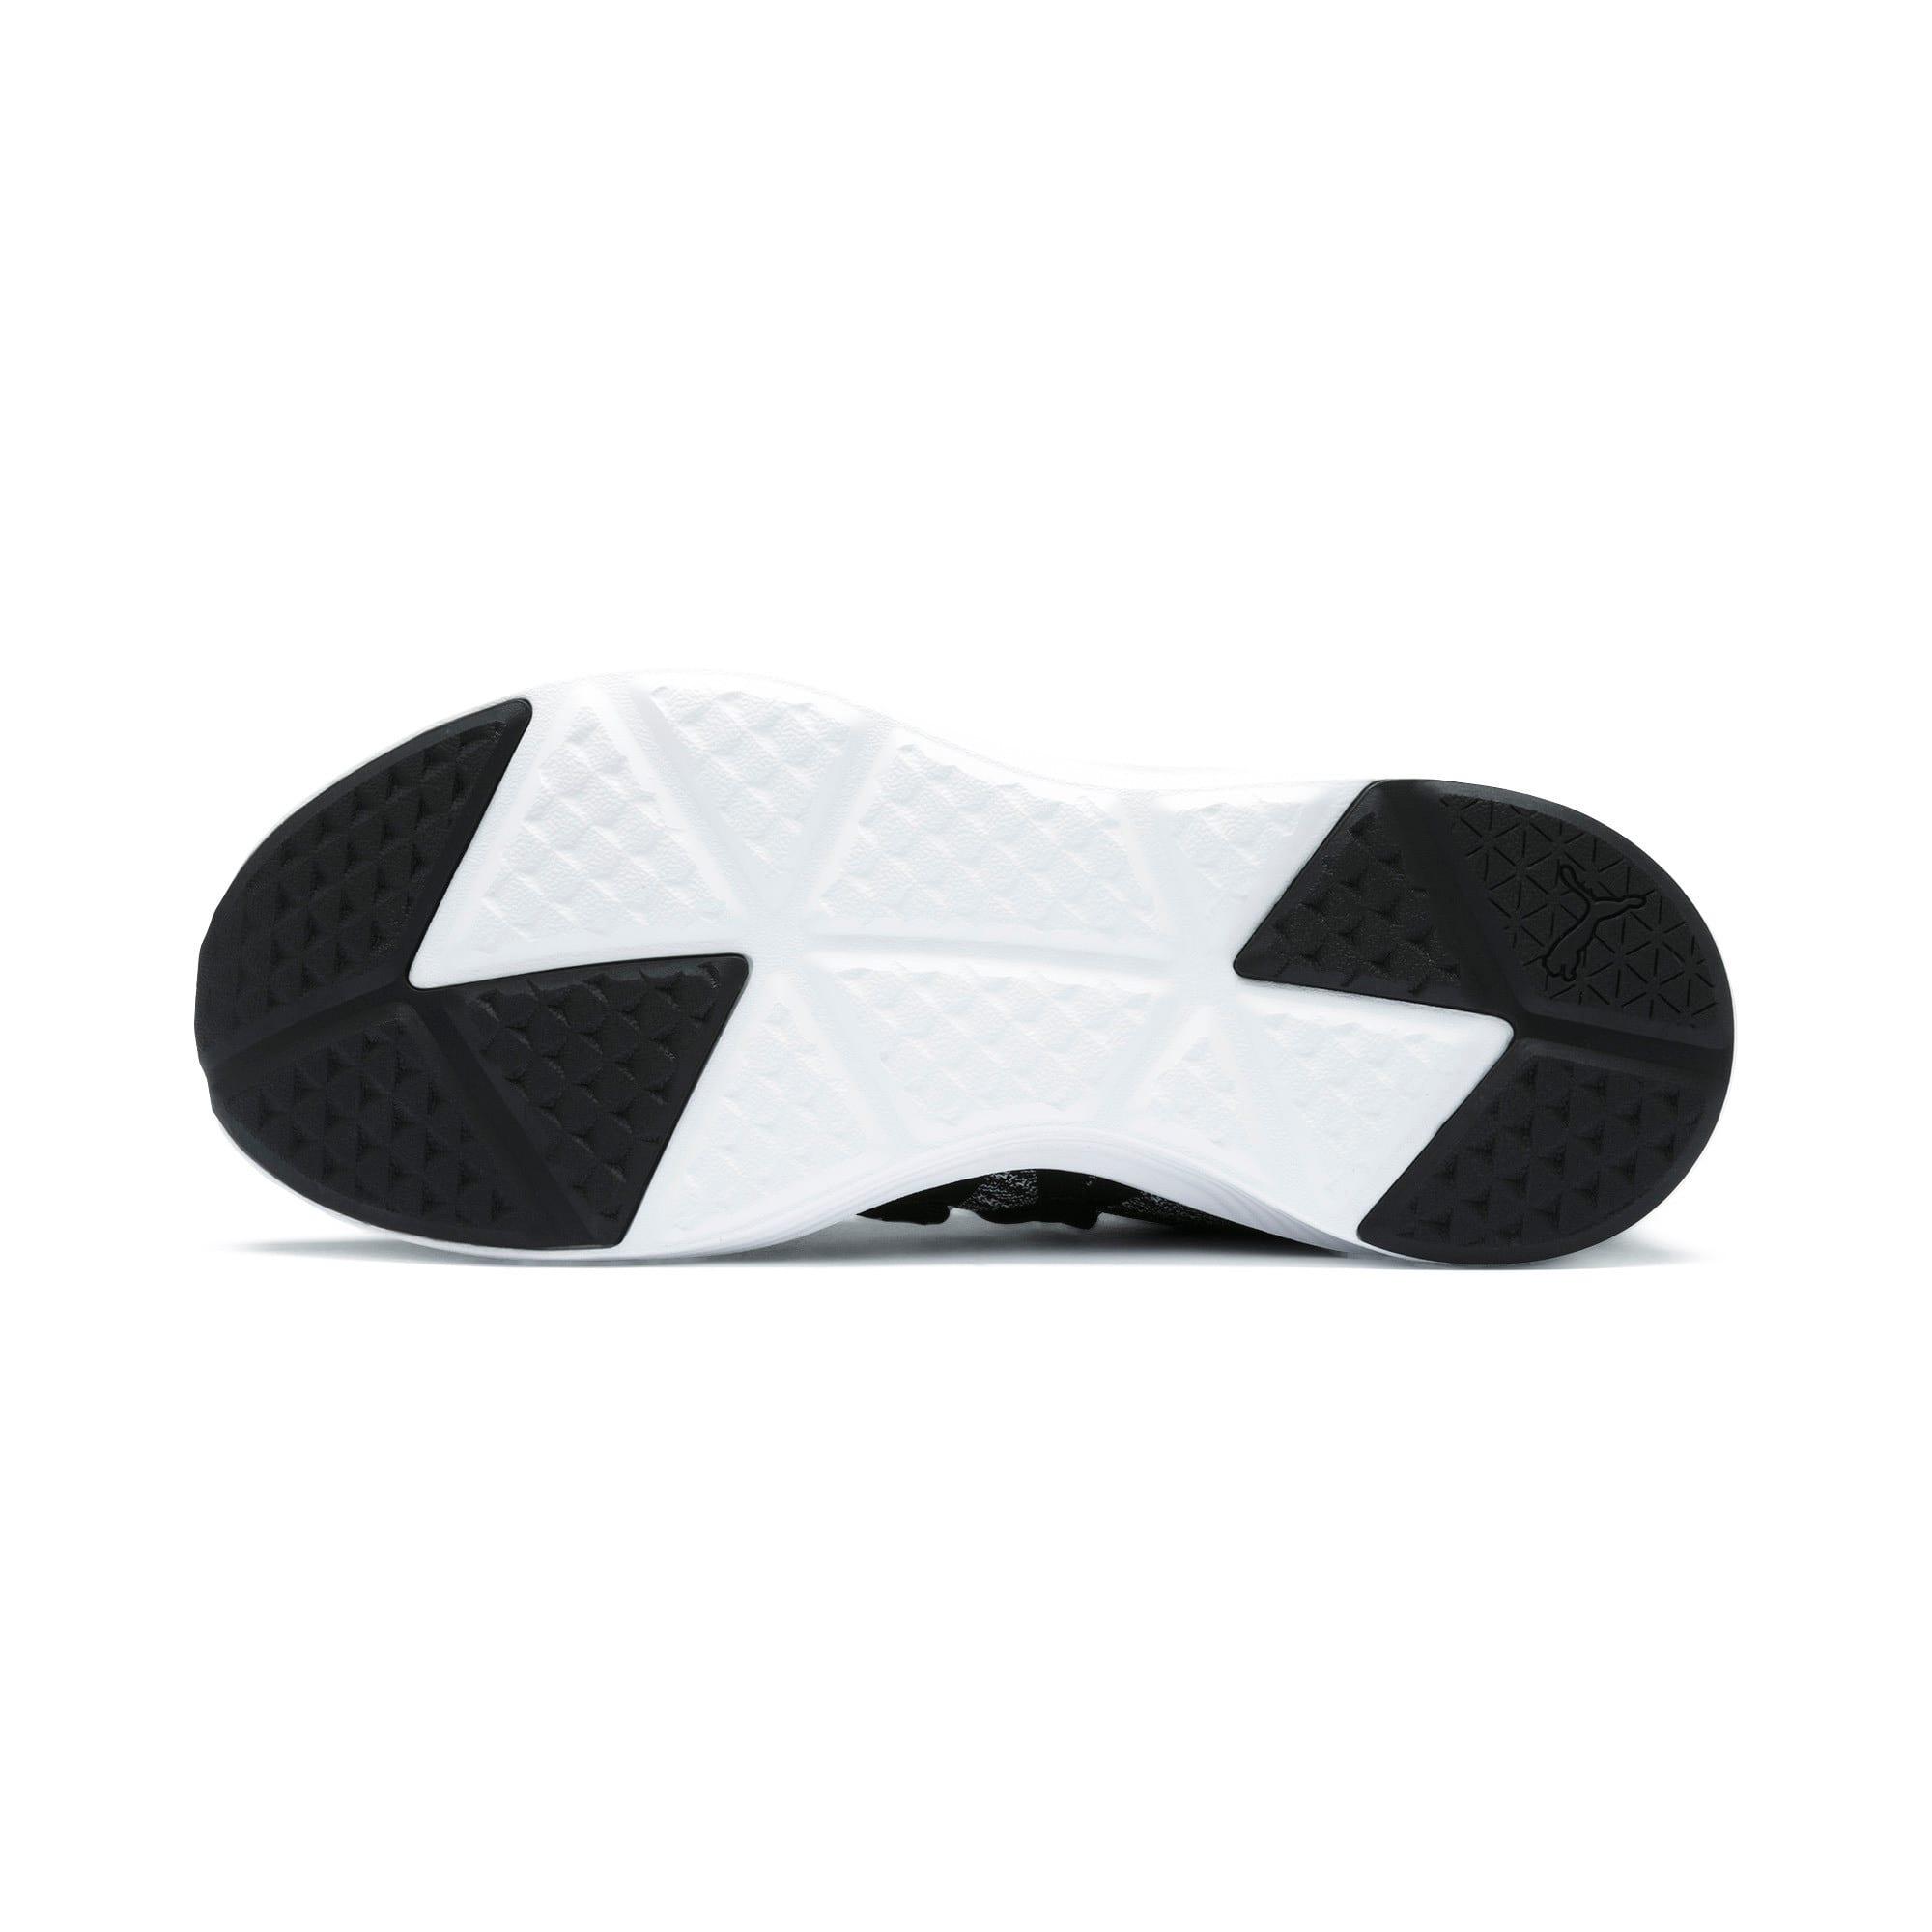 Thumbnail 5 of Prowl Alt Neon Women's Training Shoes, Puma Black-Puma White, medium